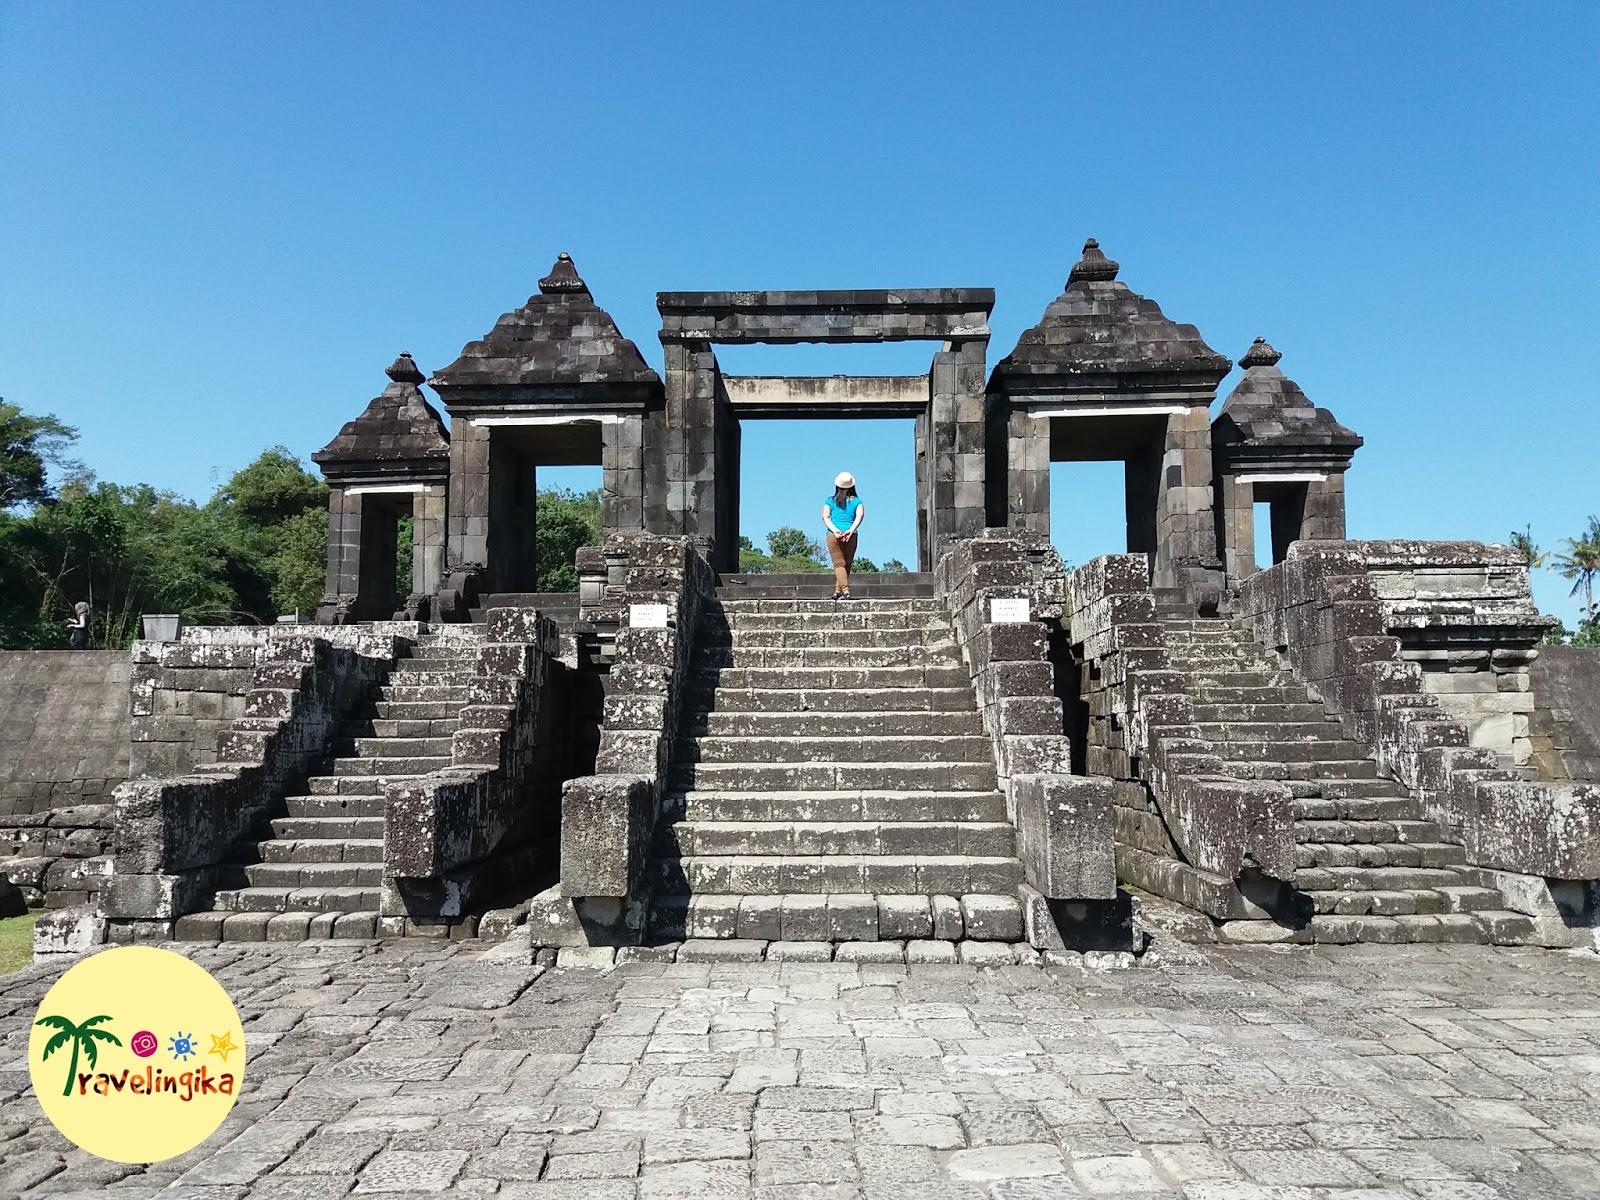 Ratu Boko Palace Yogyakarta Reruntuhan Keraton Megah Jadi Sewaktu Berkunjung